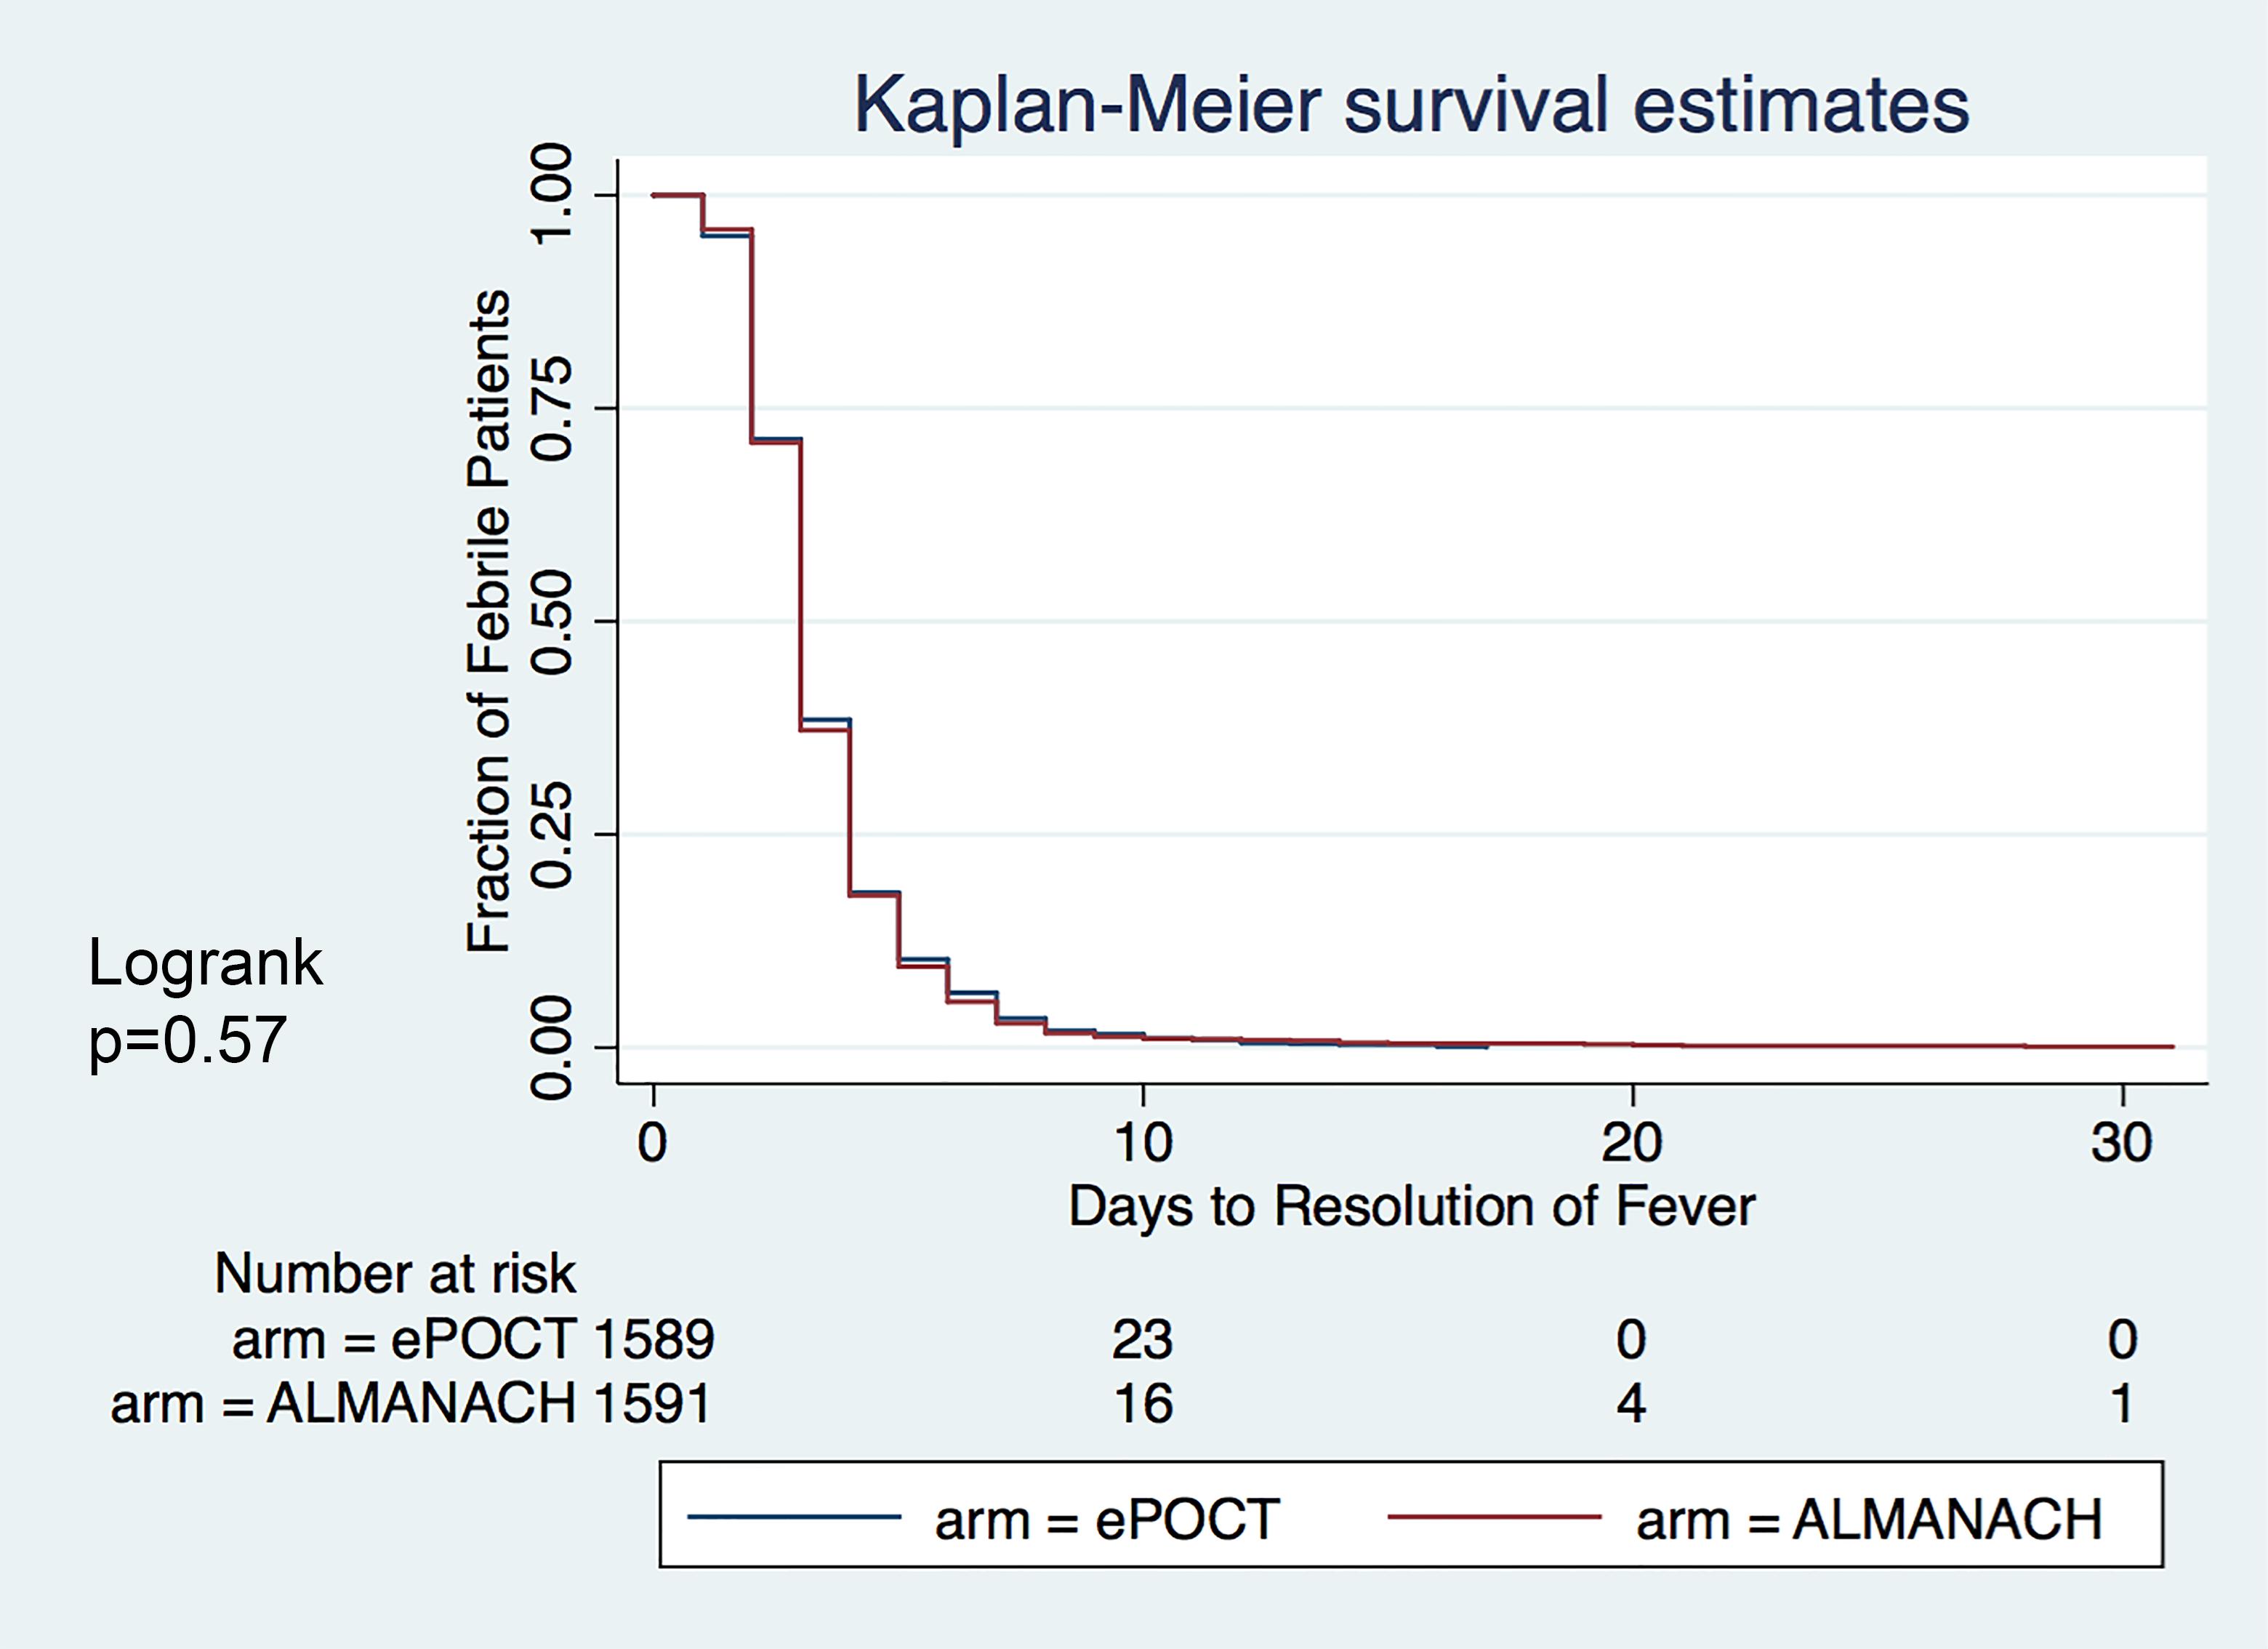 Kaplan–Meier survival estimates: Days to resolution of fever.